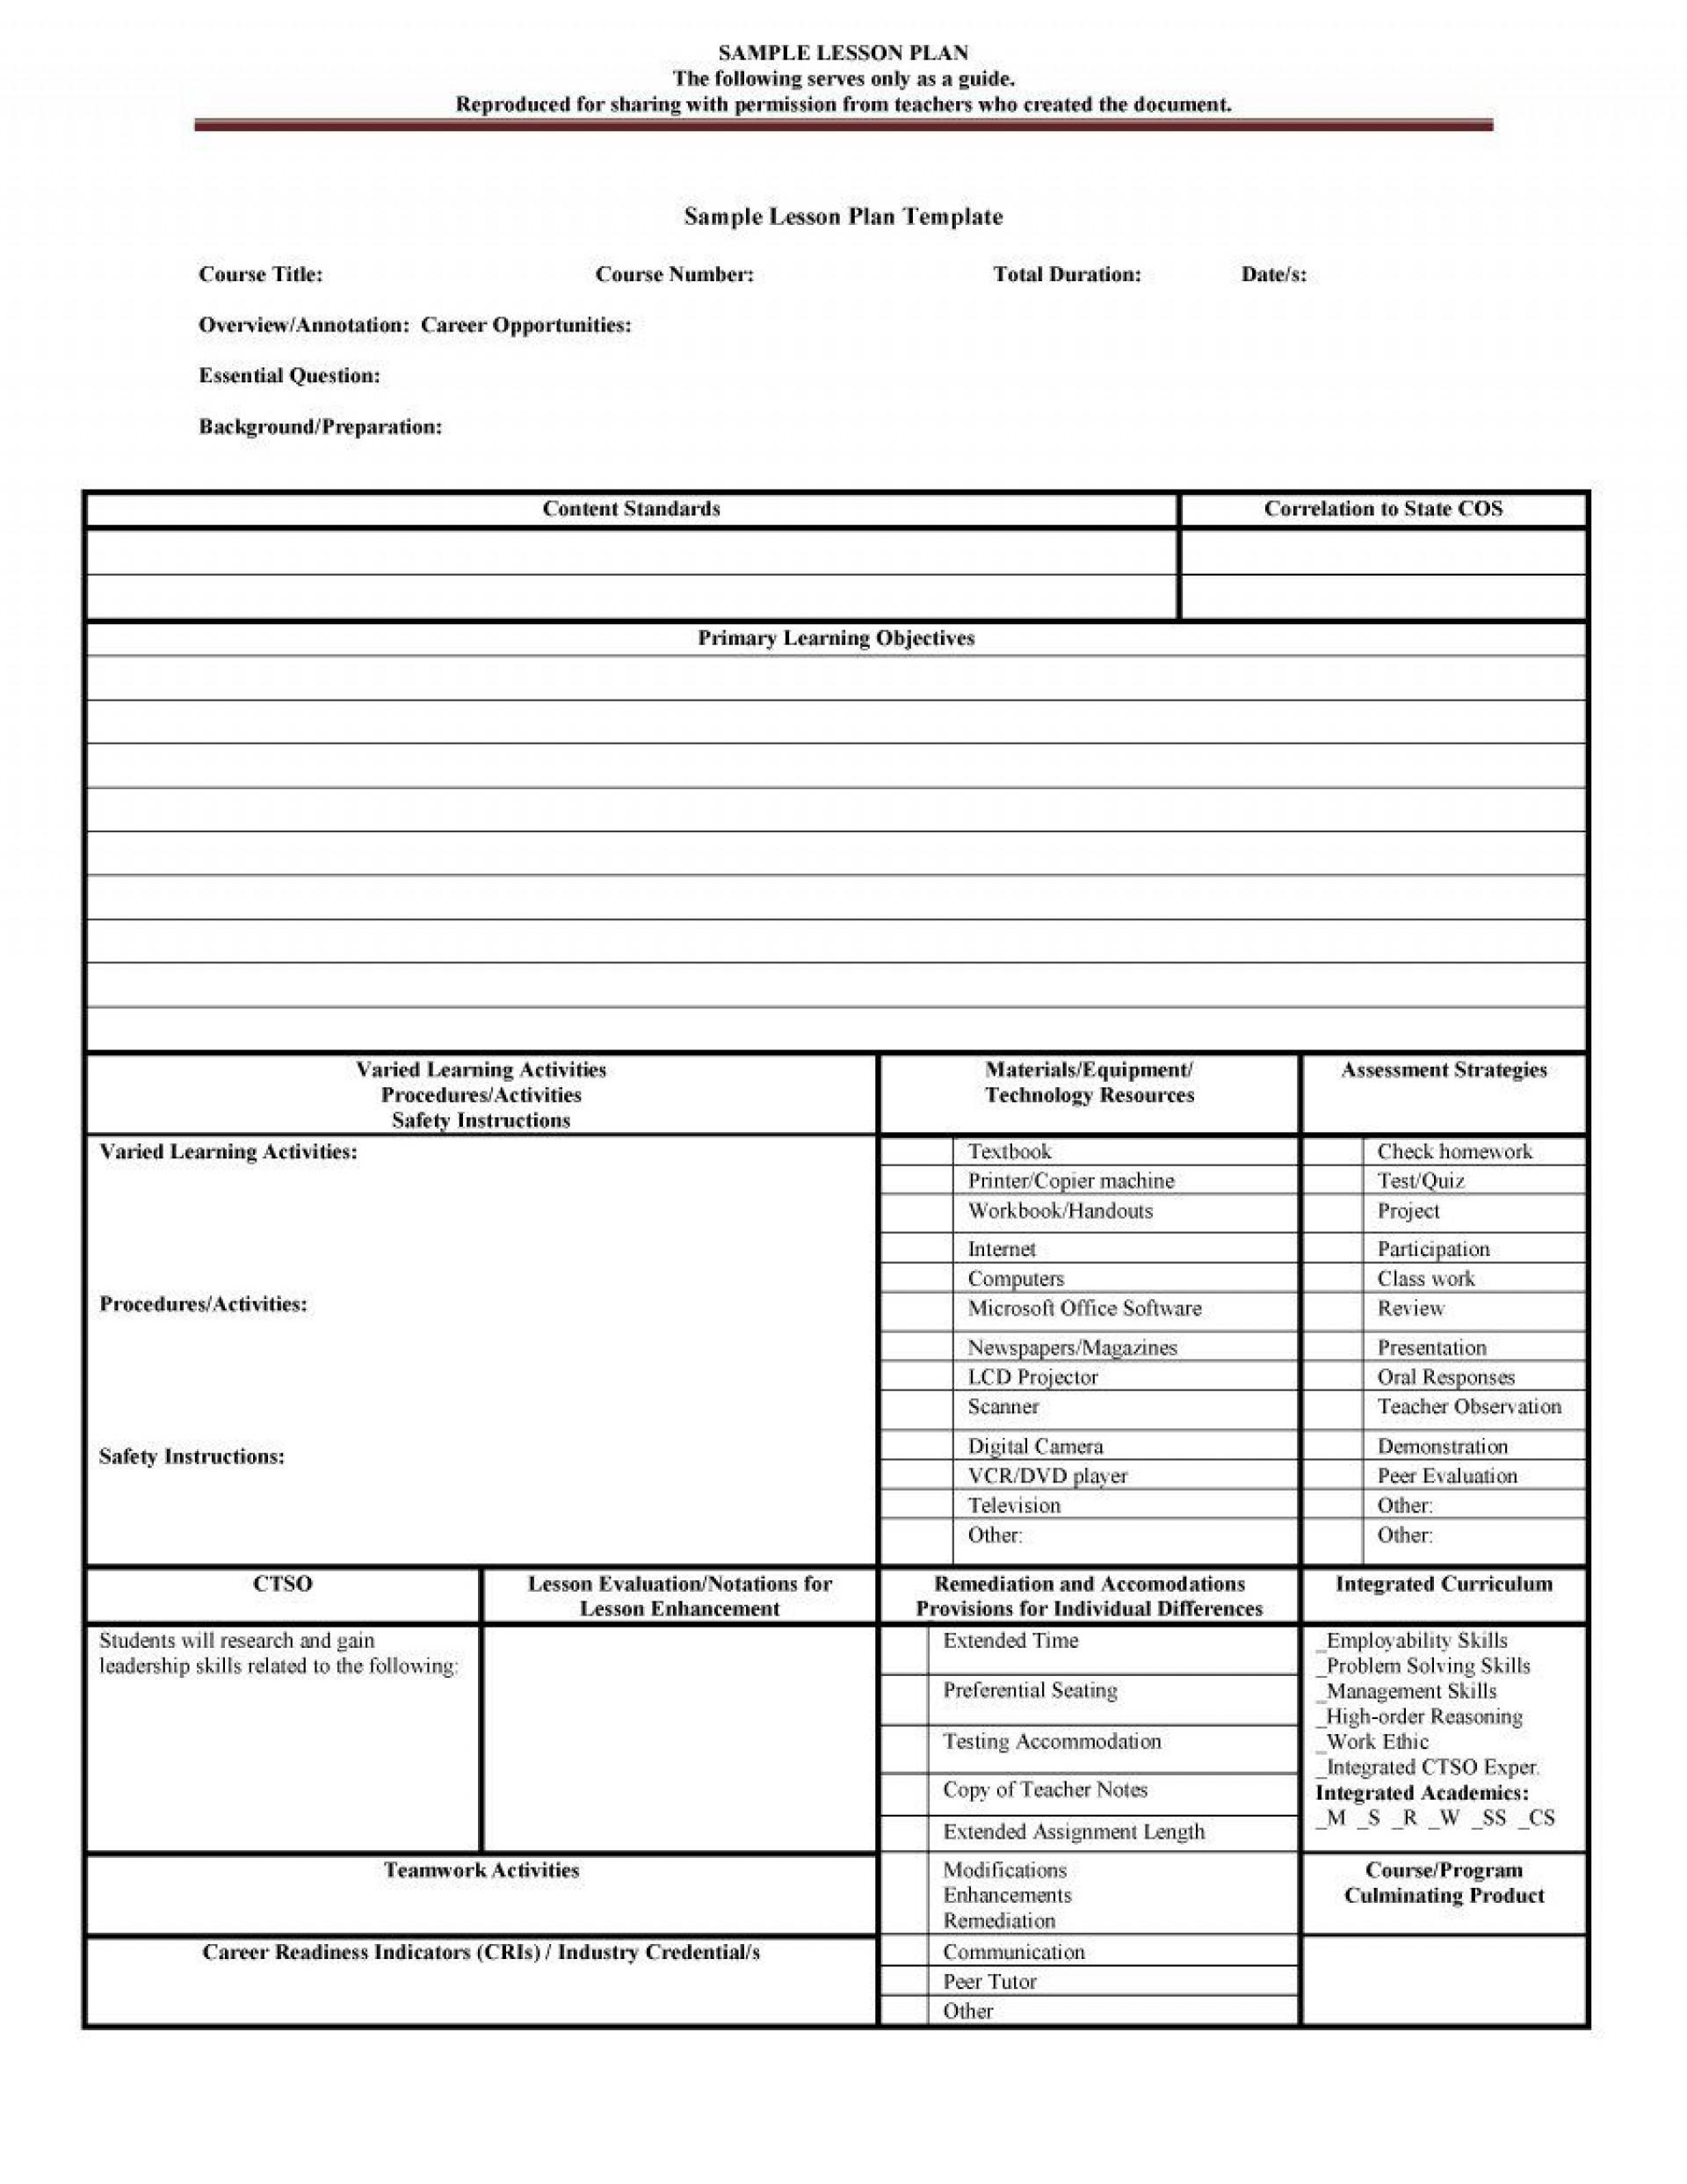 008 Wondrou Lesson Plan Template Free Sample  Weekly Printable Editable Preschool Format1920